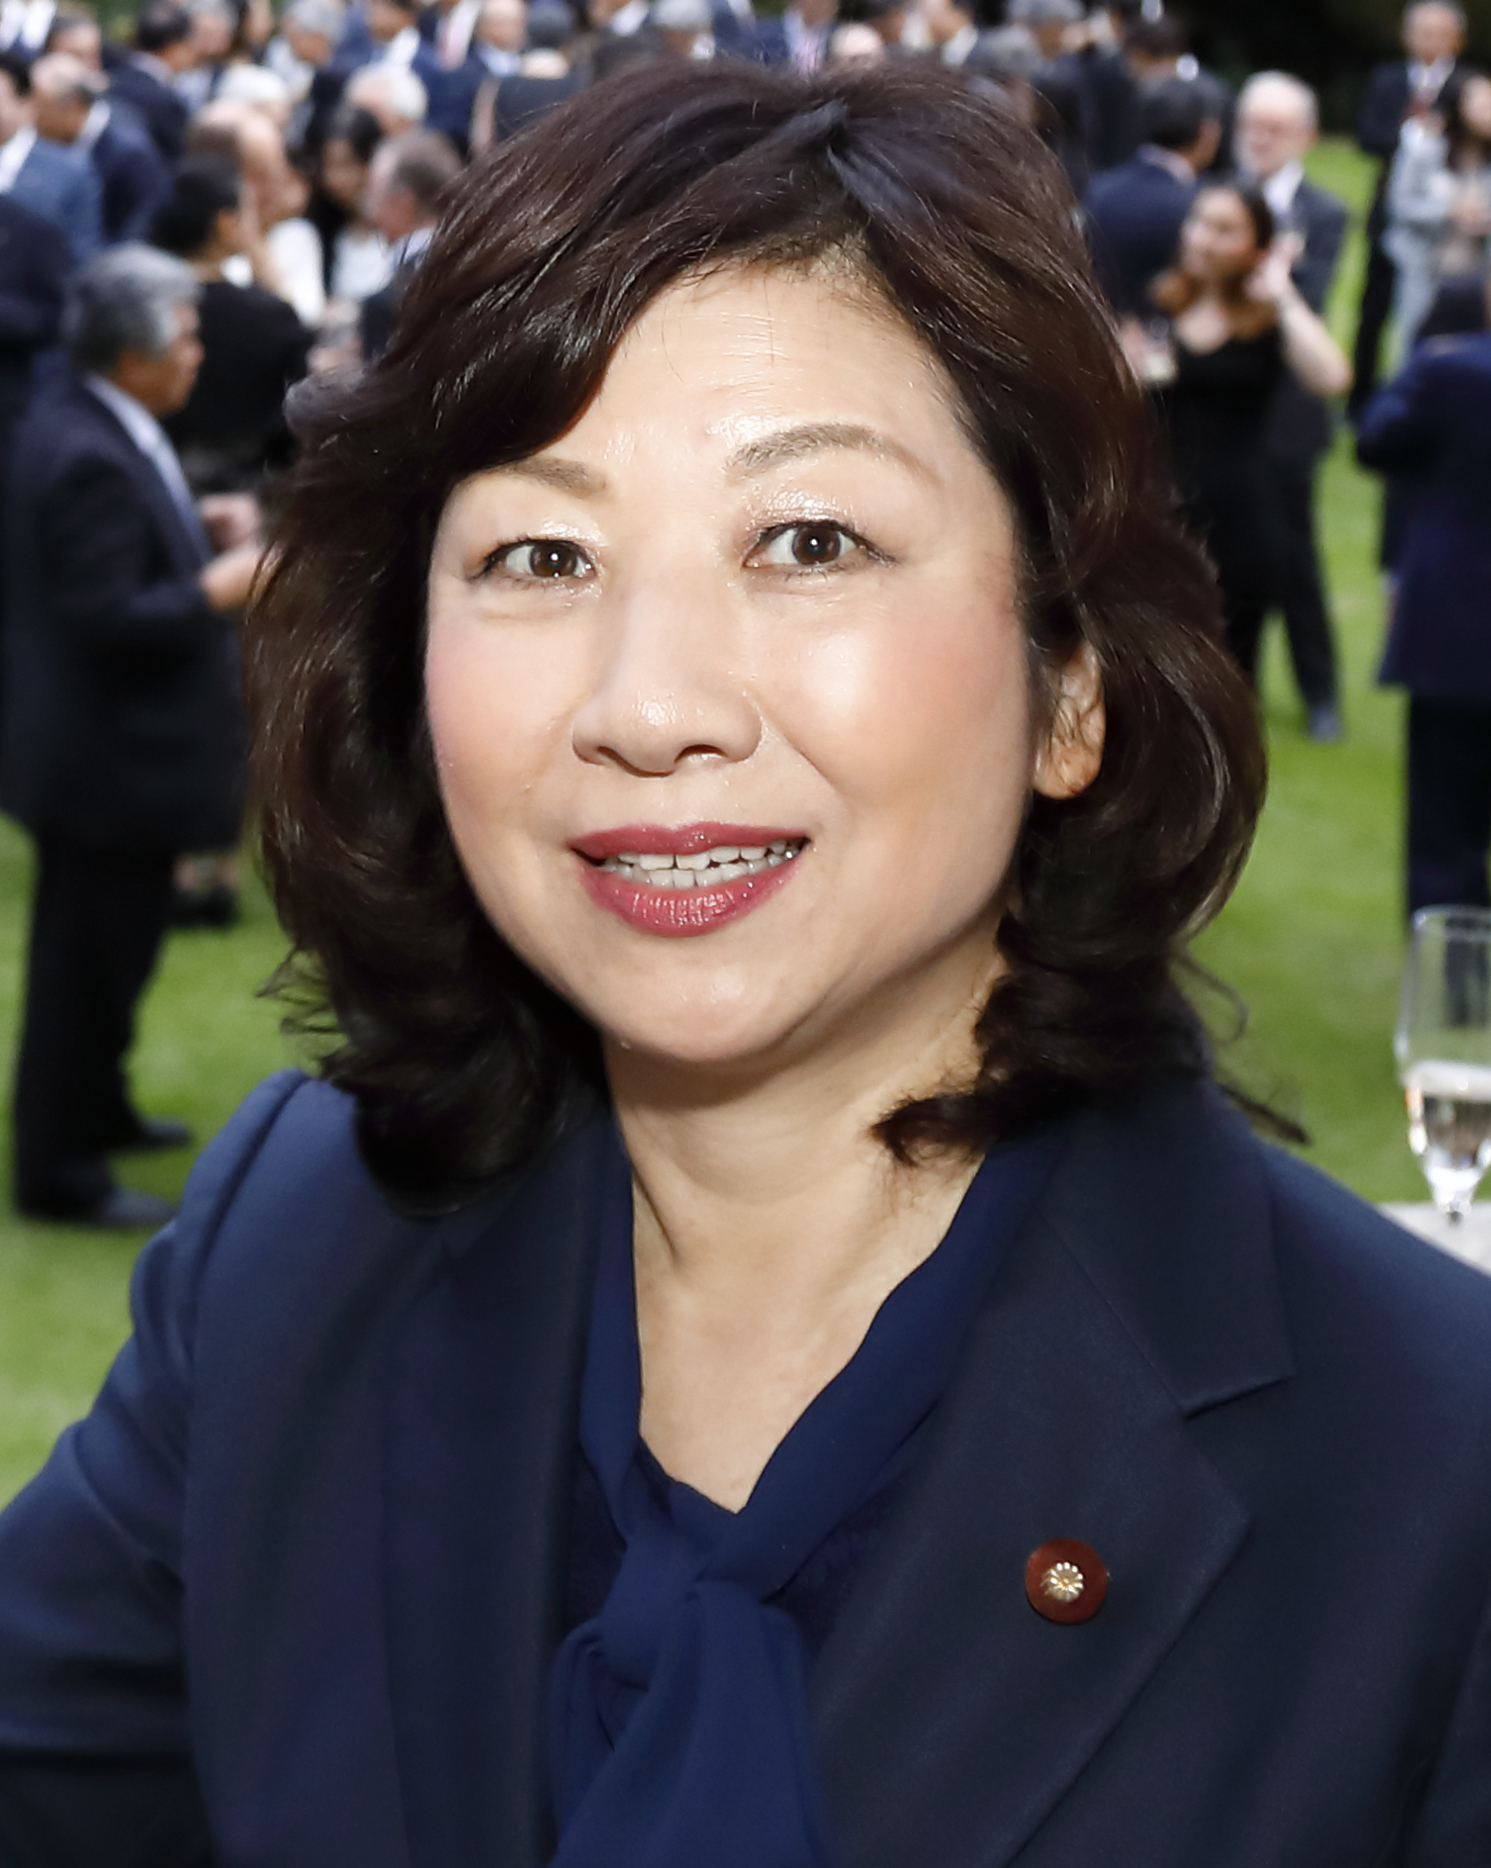 野田聖子 - Wikipedia